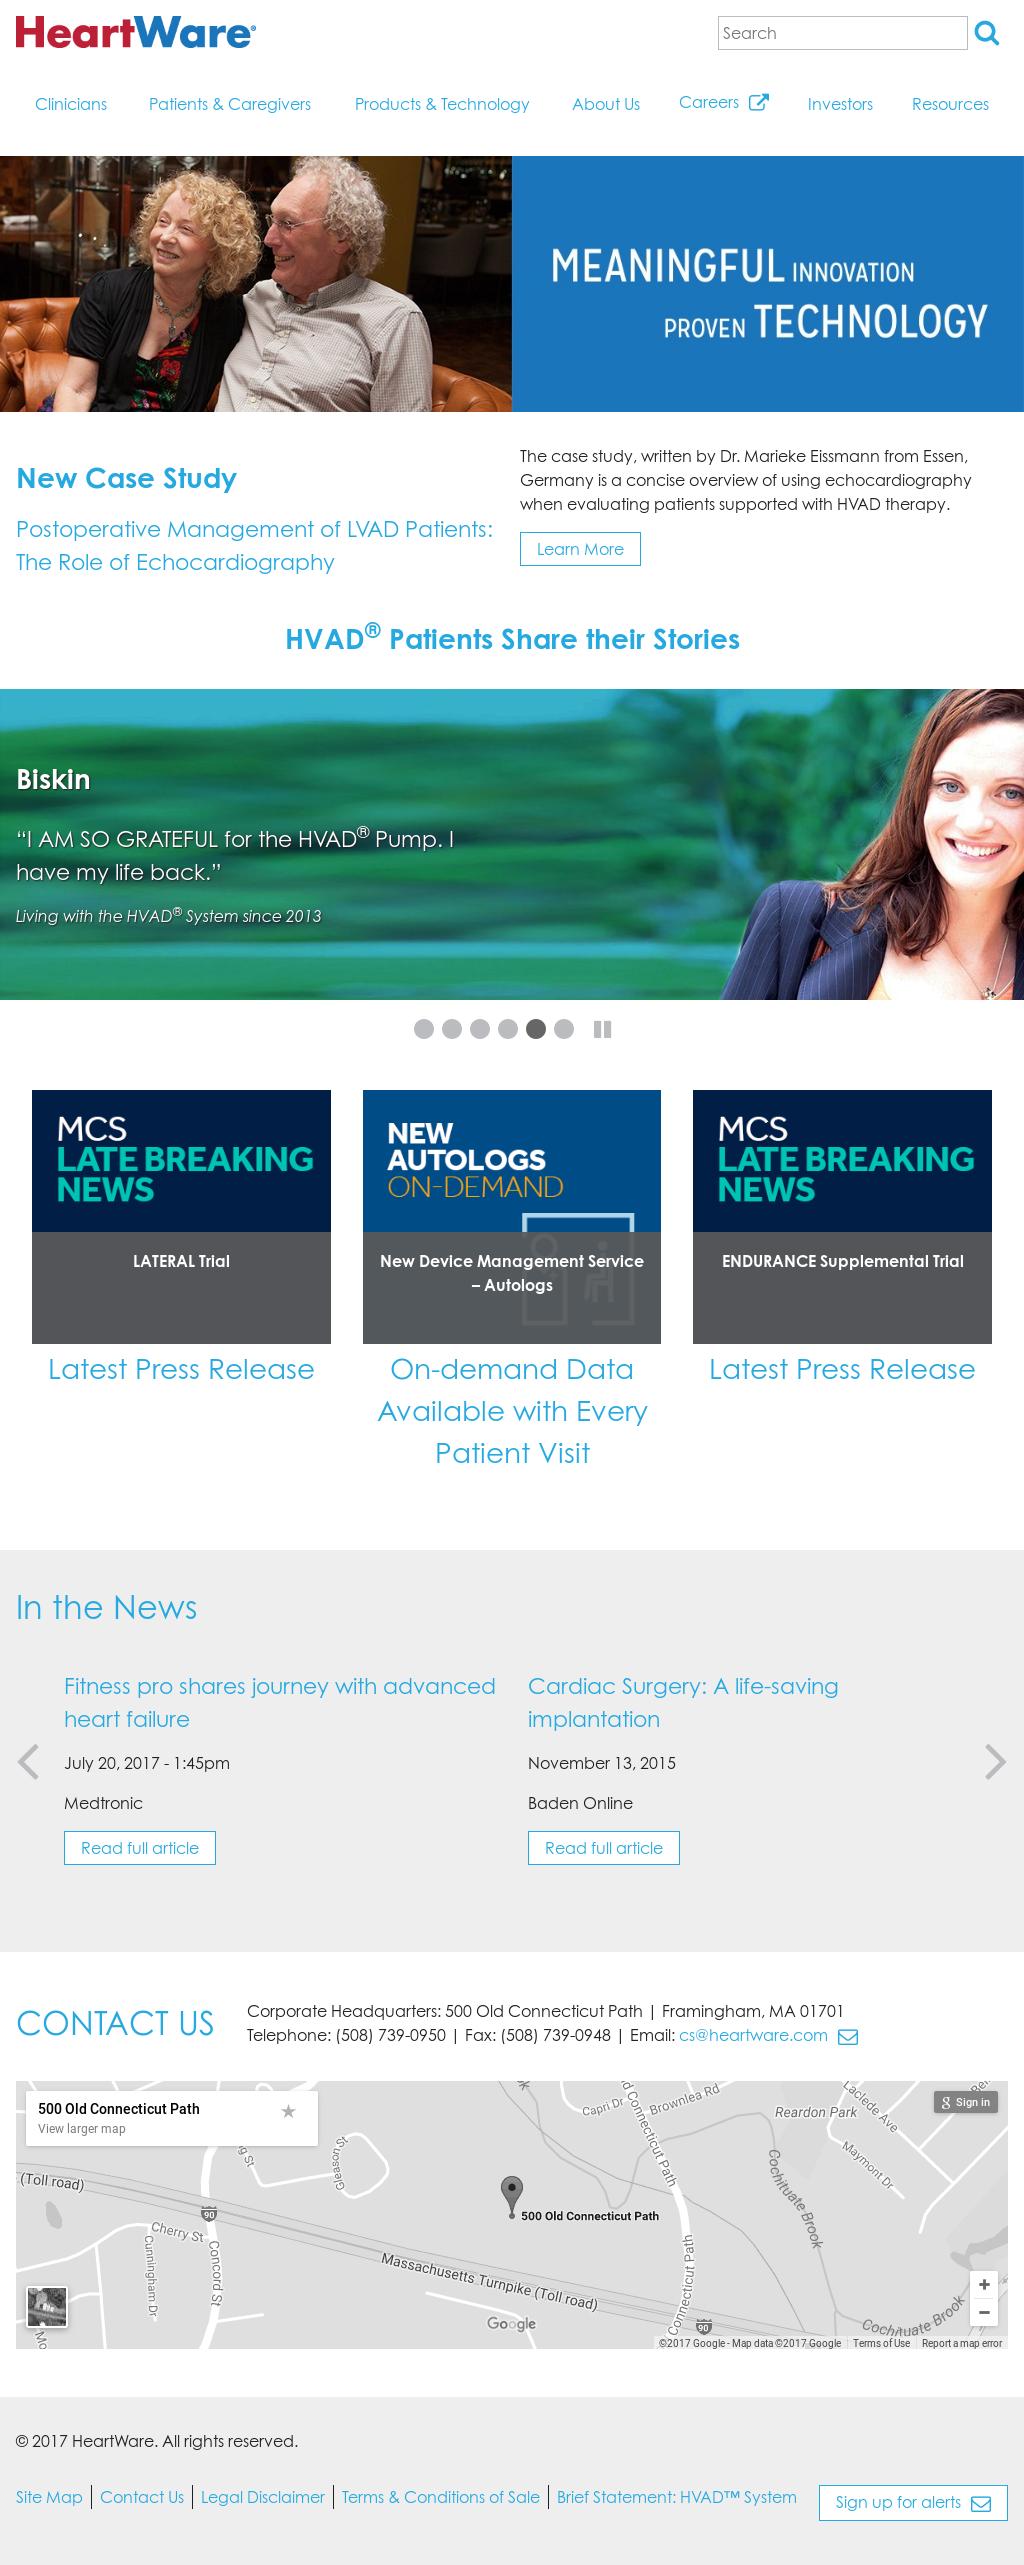 HeartWare Competitors, Revenue and Employees - Owler Company Profile